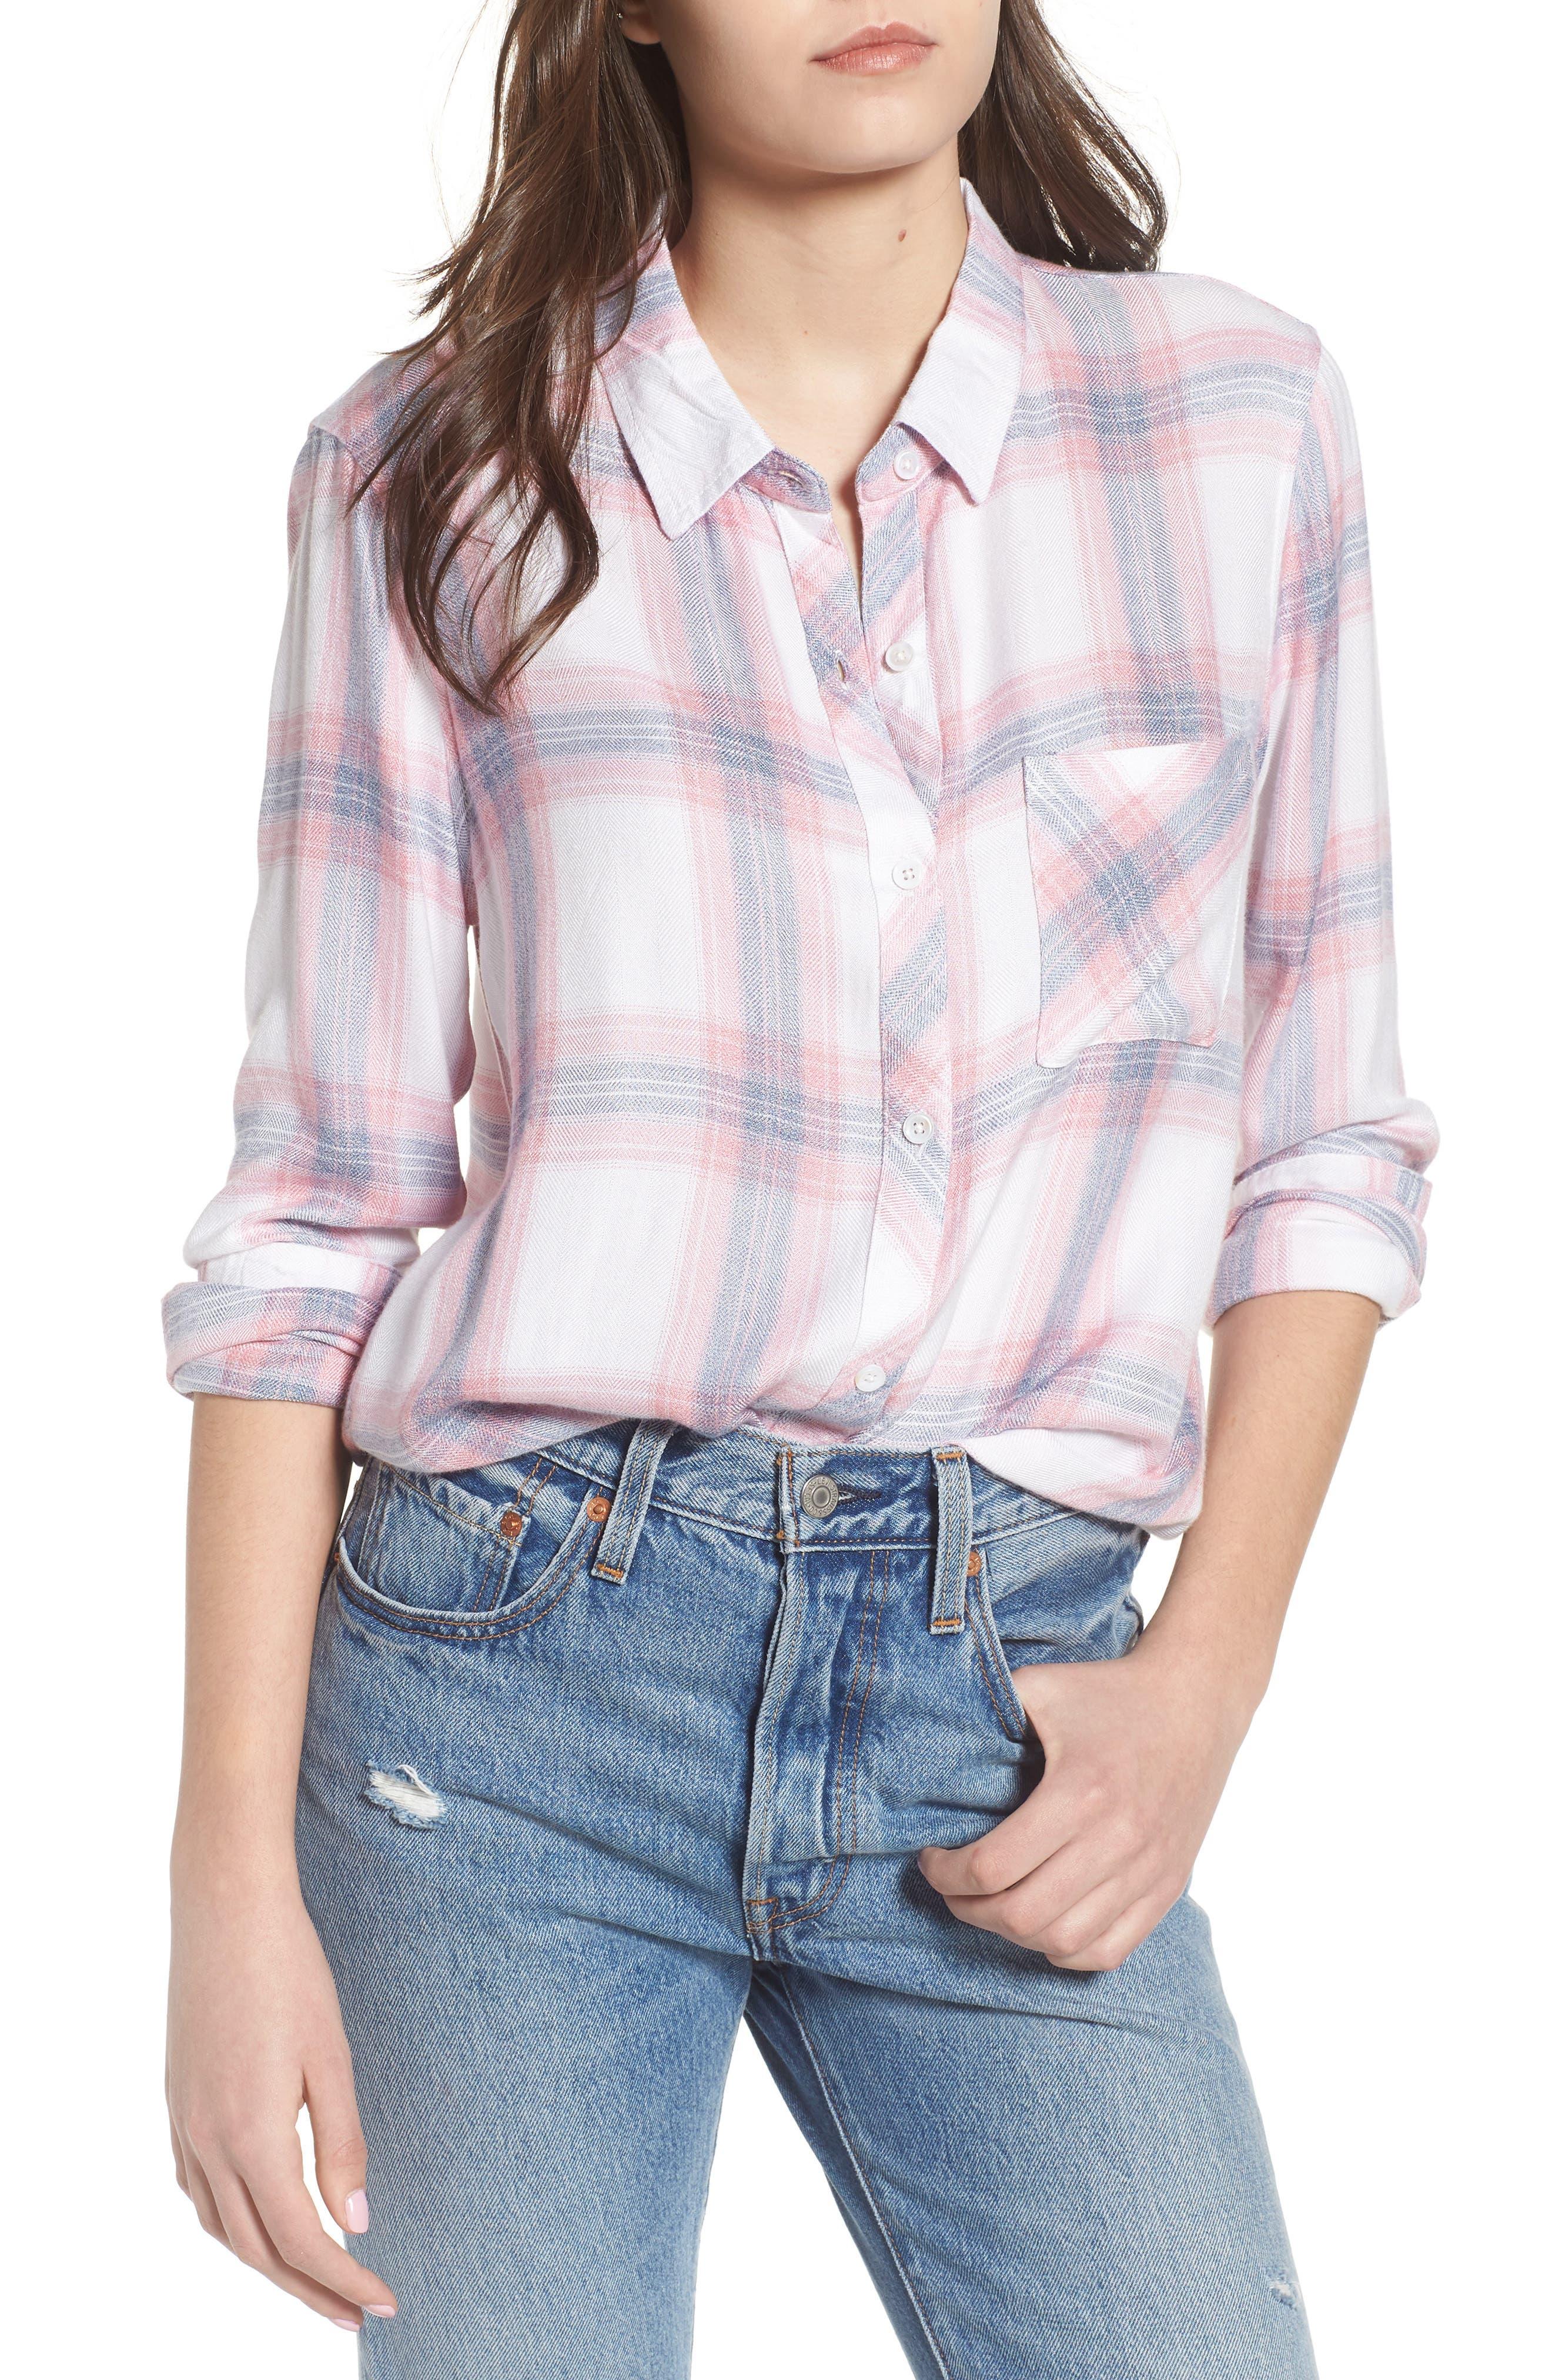 Carina Plaid Shirt,                         Main,                         color, Red/ White Plaid